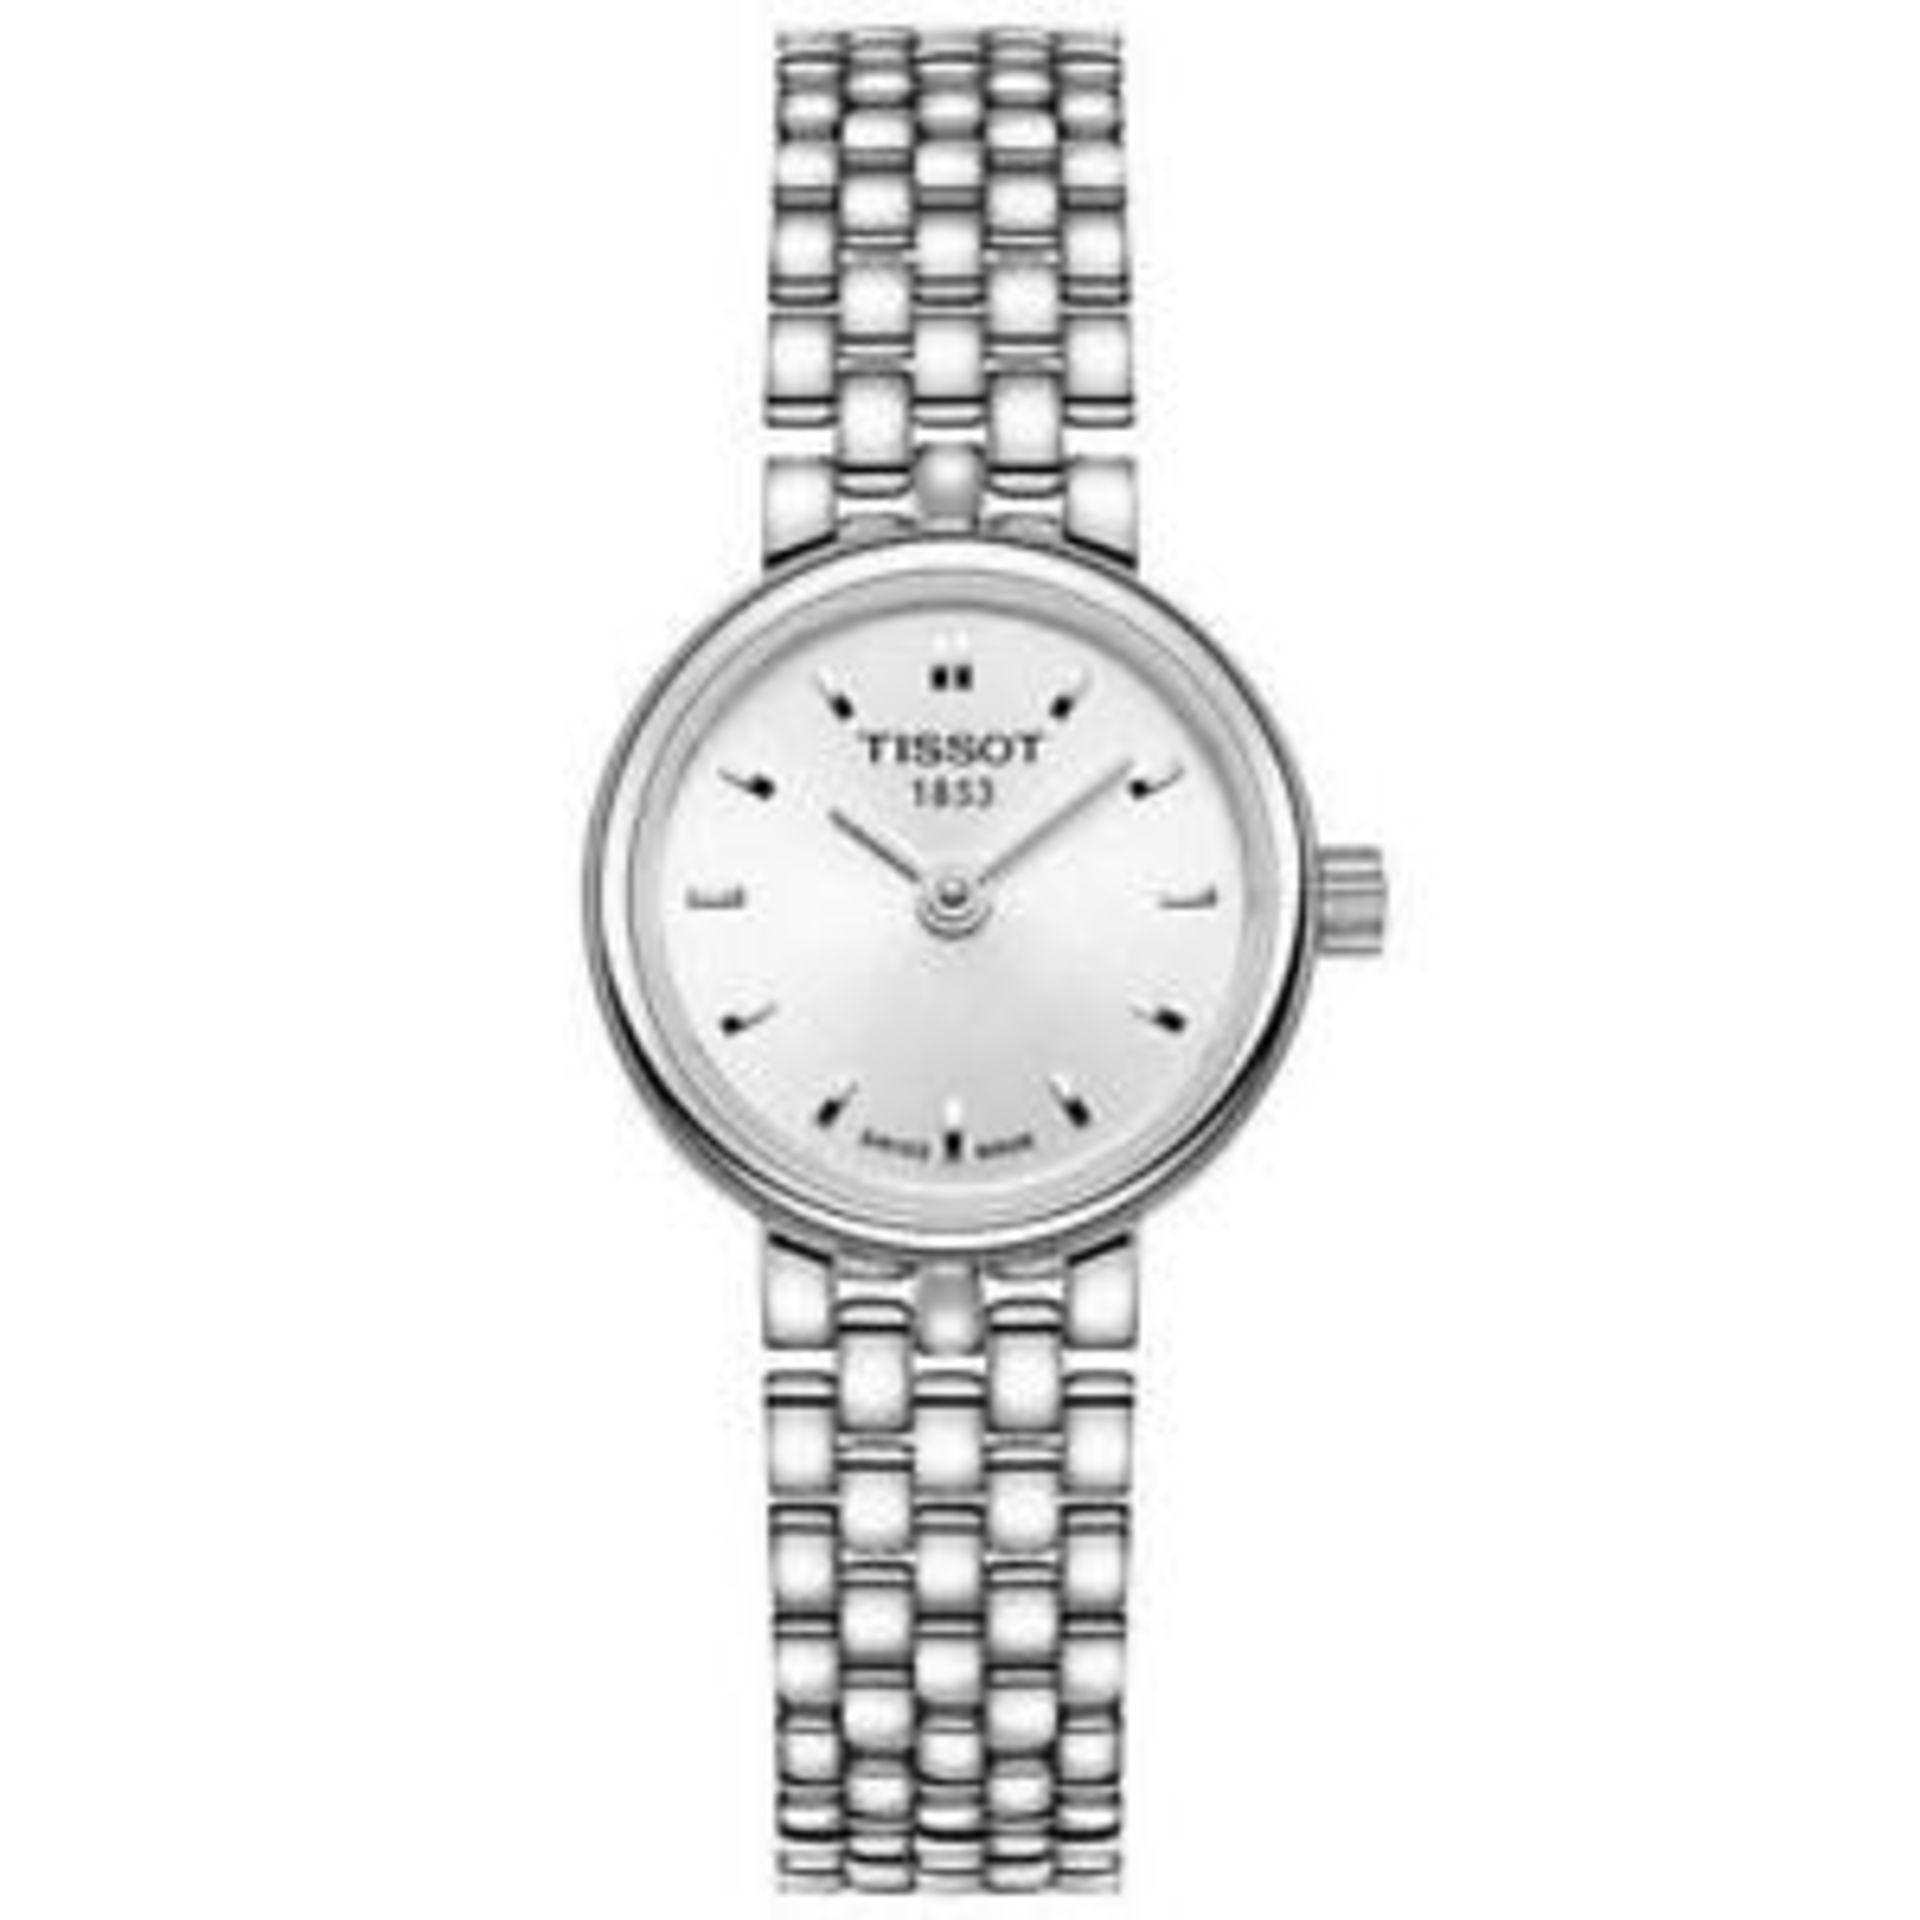 Tissot Ladies Watch TO58.009.11.031.00 - Image 2 of 3